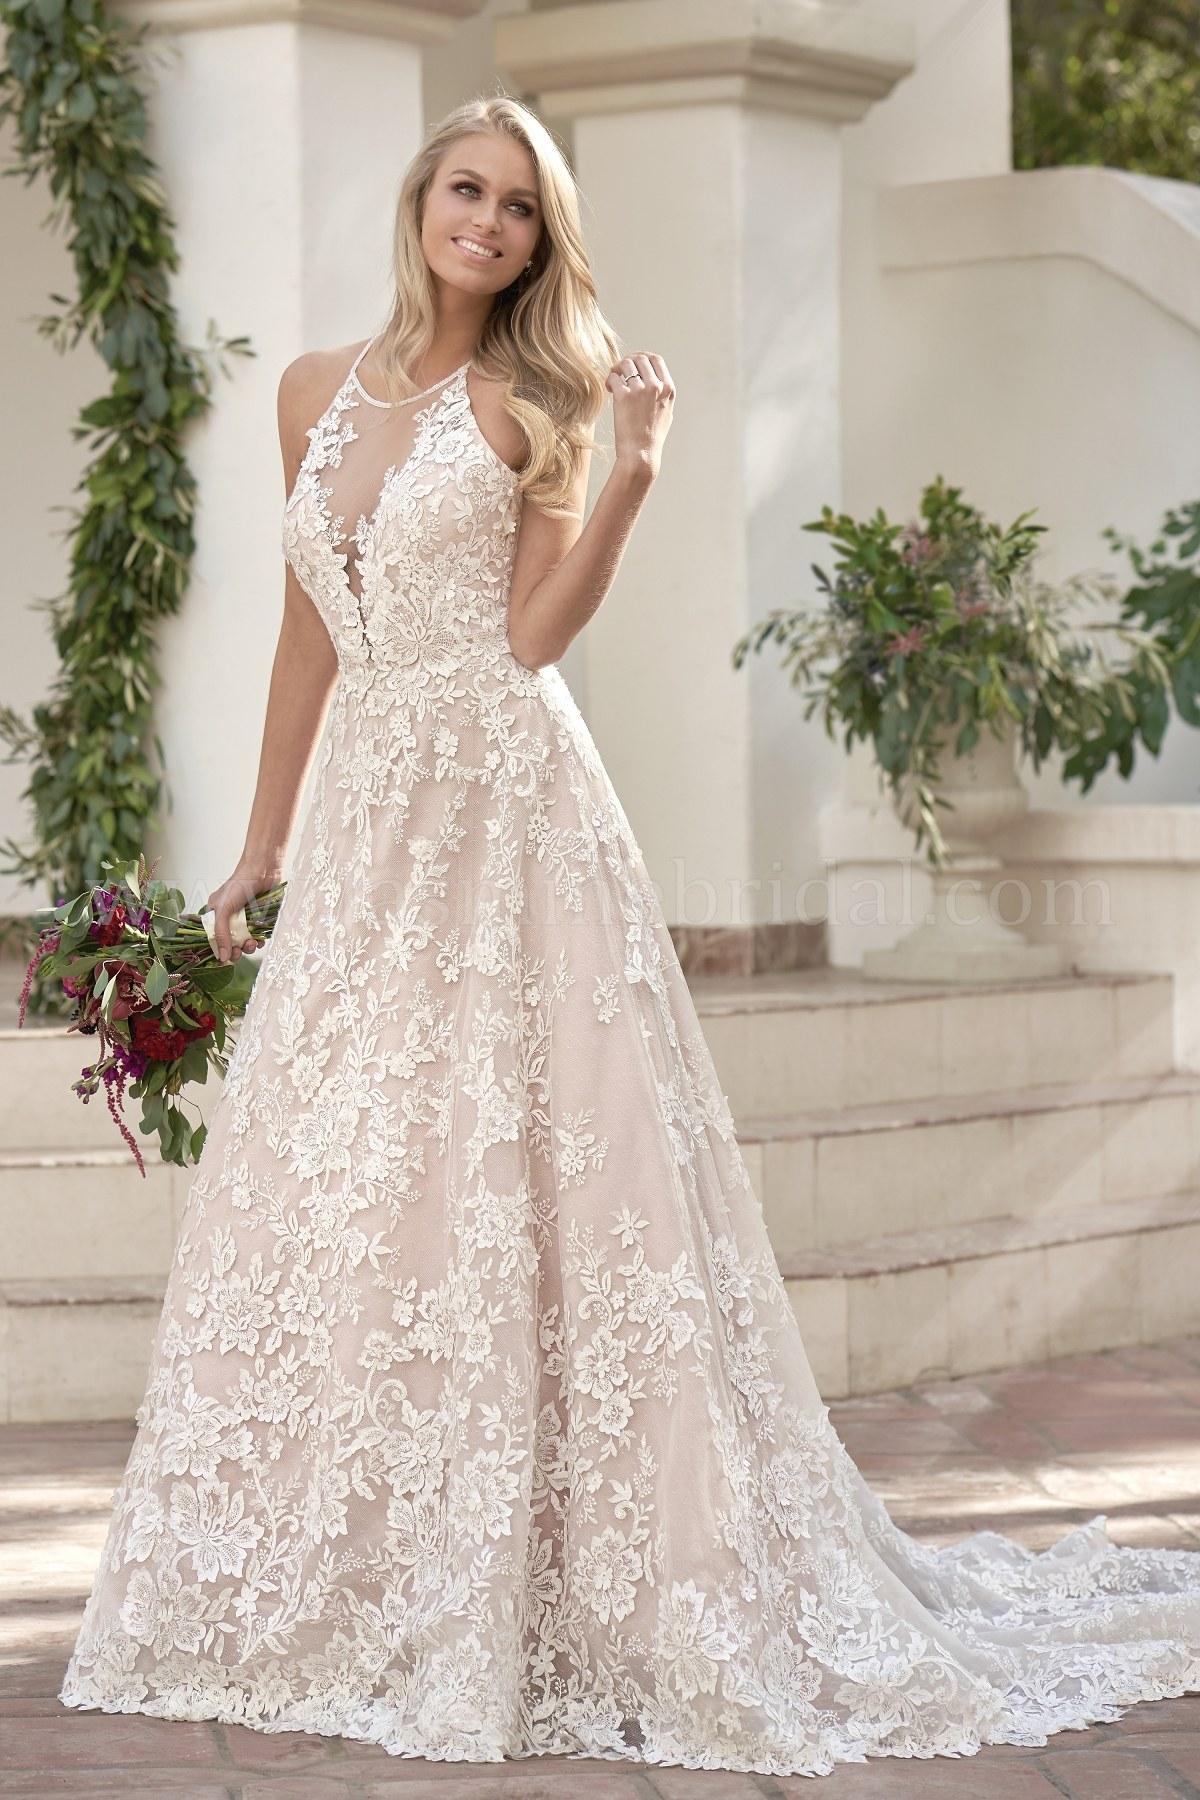 T202063 Halter Neckline Embroidered Lace Netting & Organza Wedding Dress